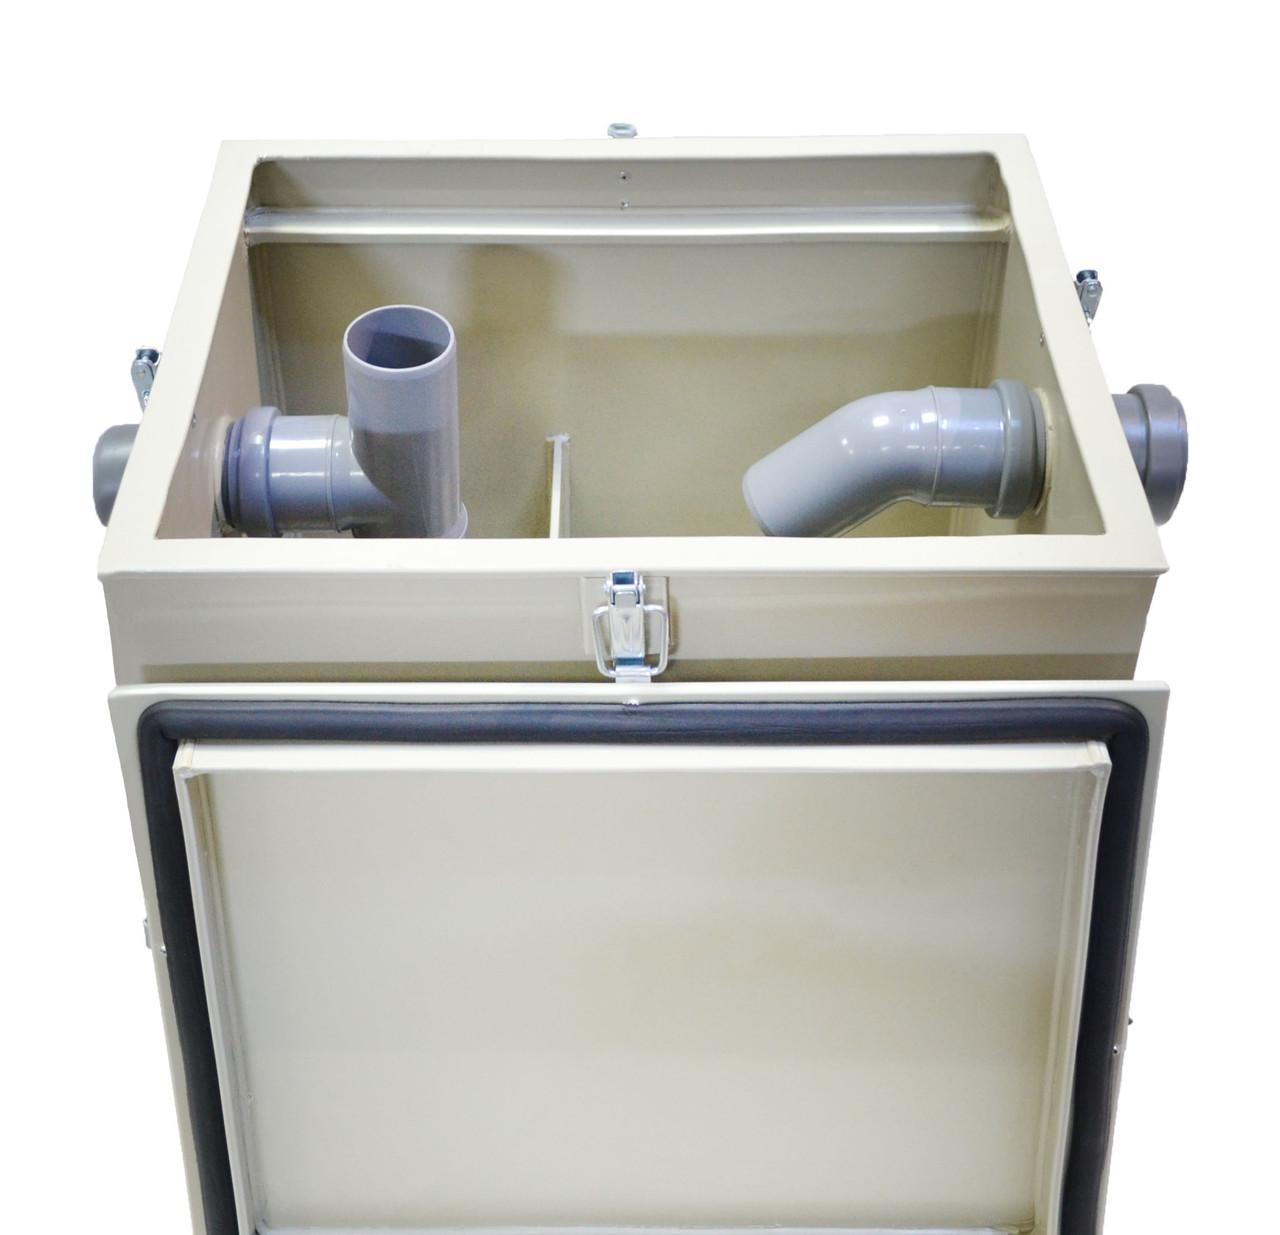 Жироуловитель (сепаратор жира) под мойку СЖ-БИО-0,5П